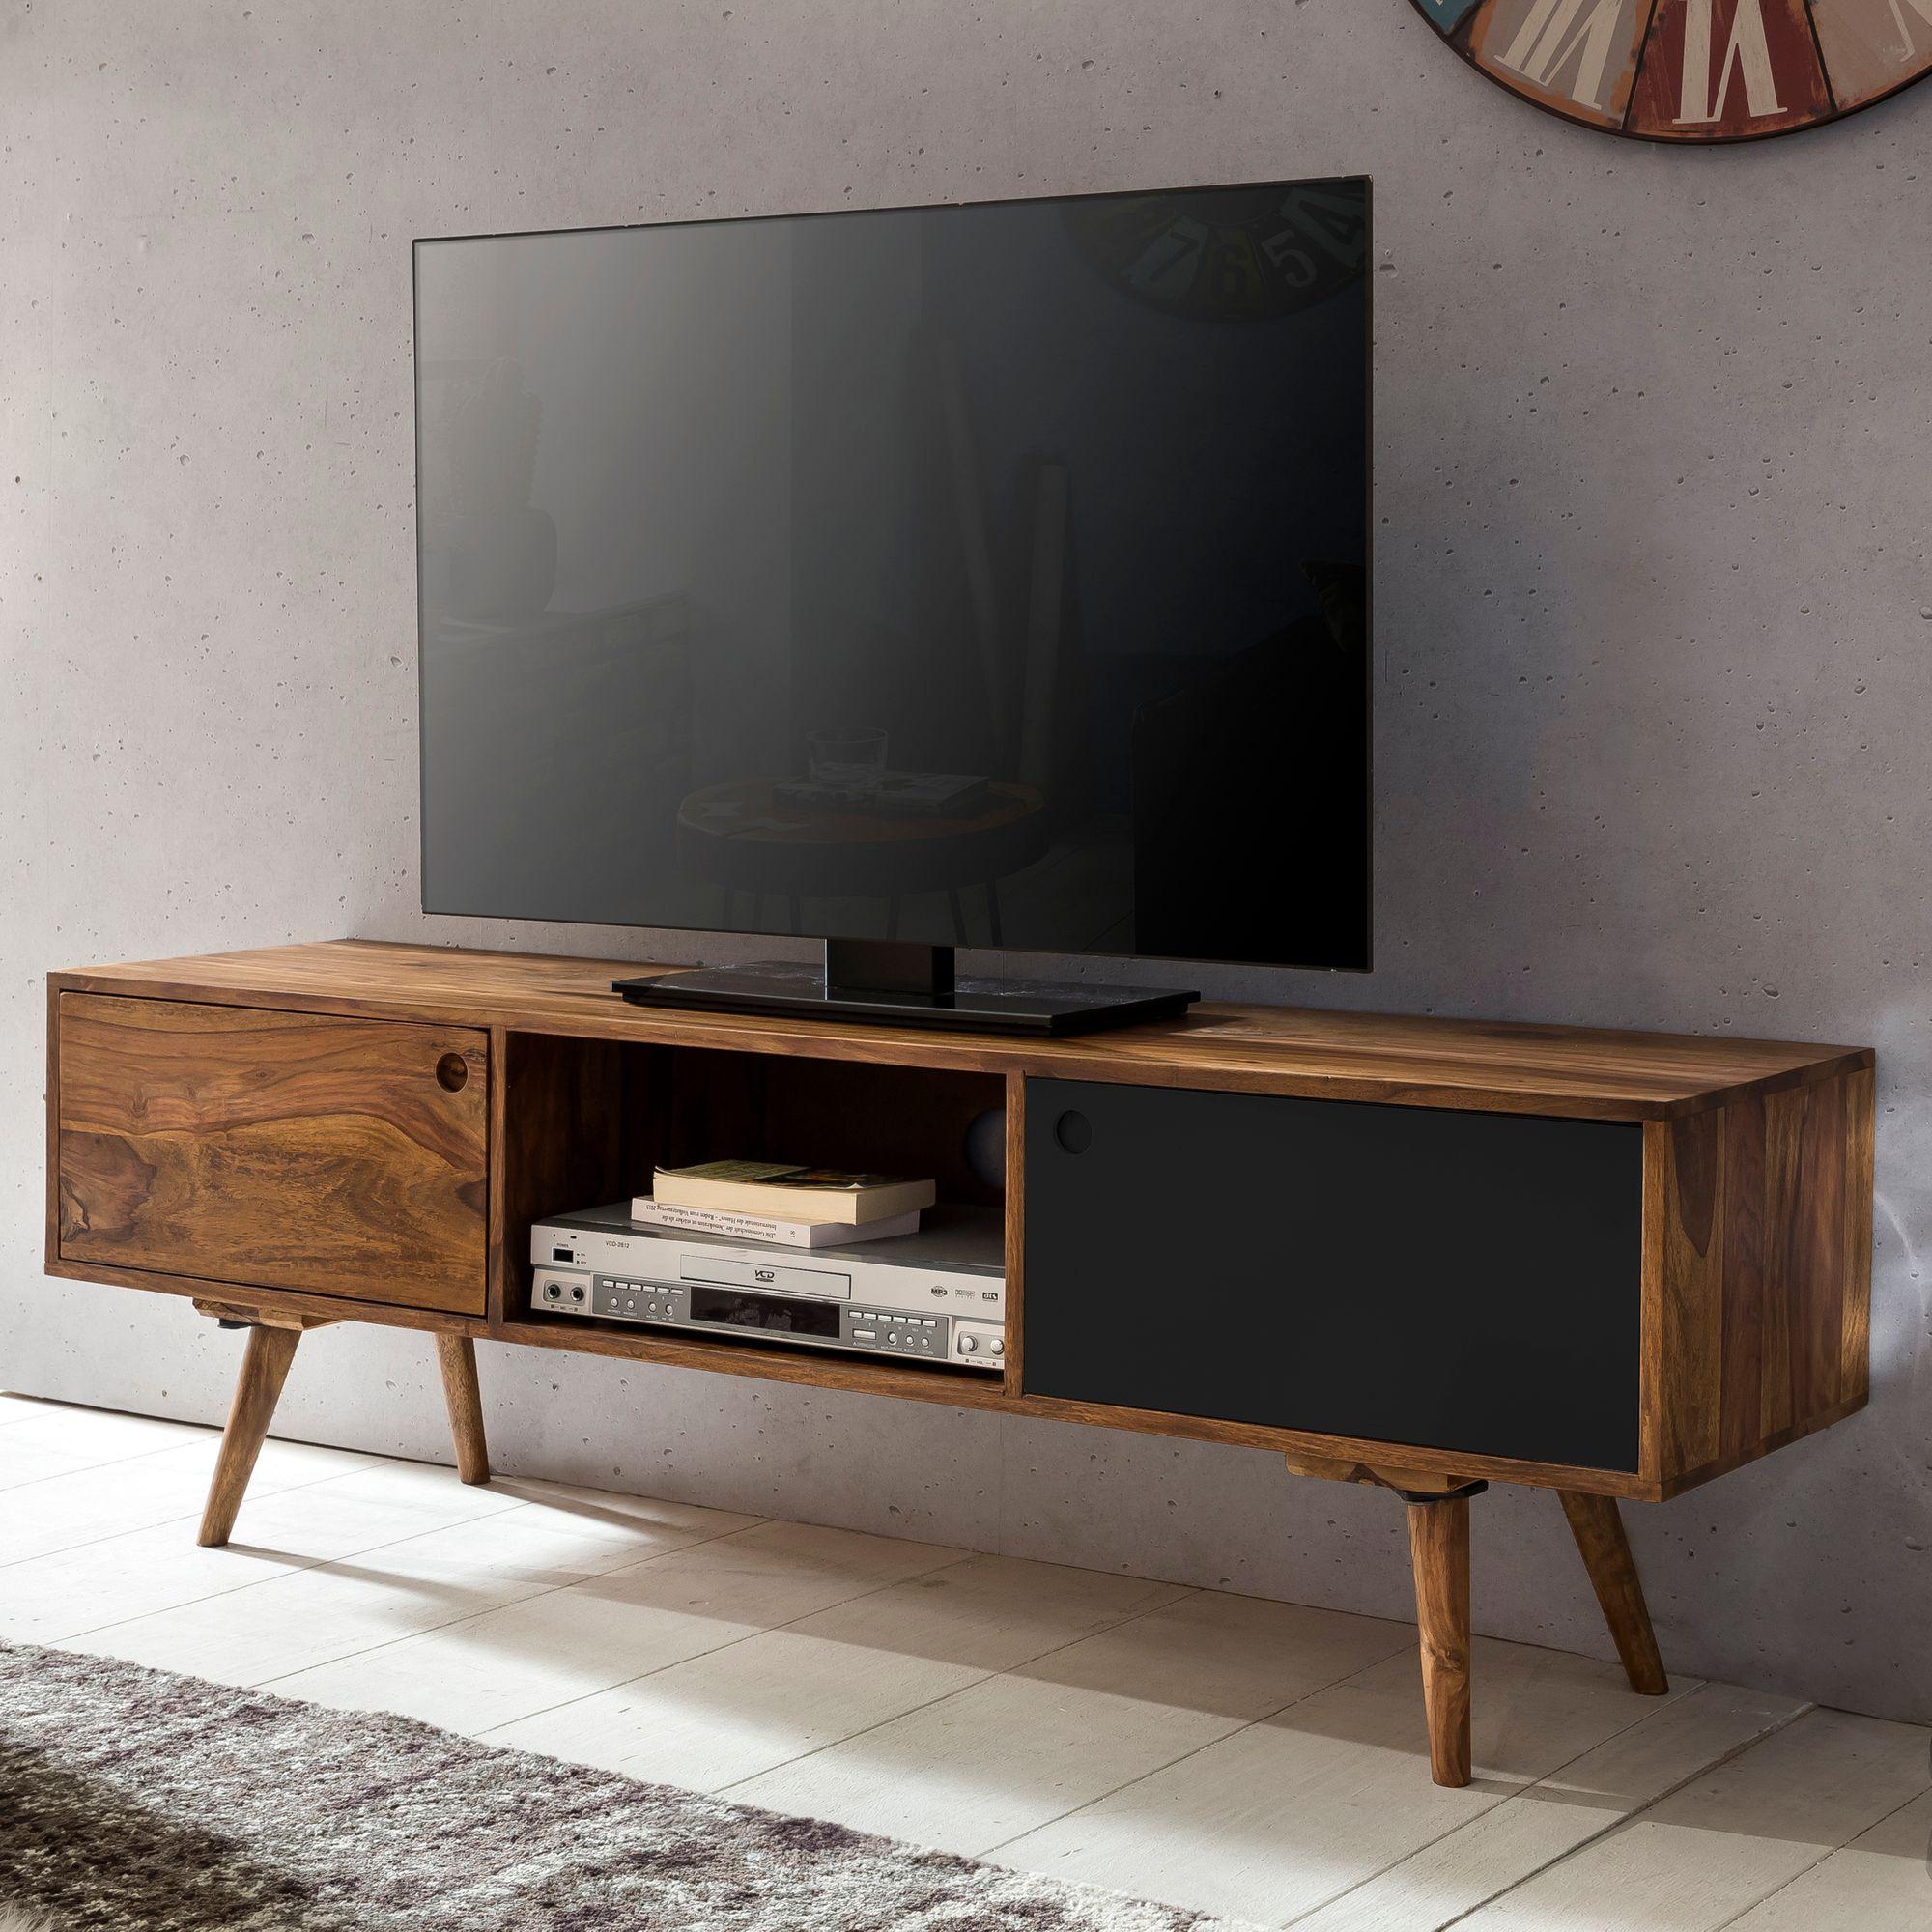 Tv Lowboard Repa 140 Cm Massiv Holz Sheesham Landhaus 2 Turen Fach Hifi Regal